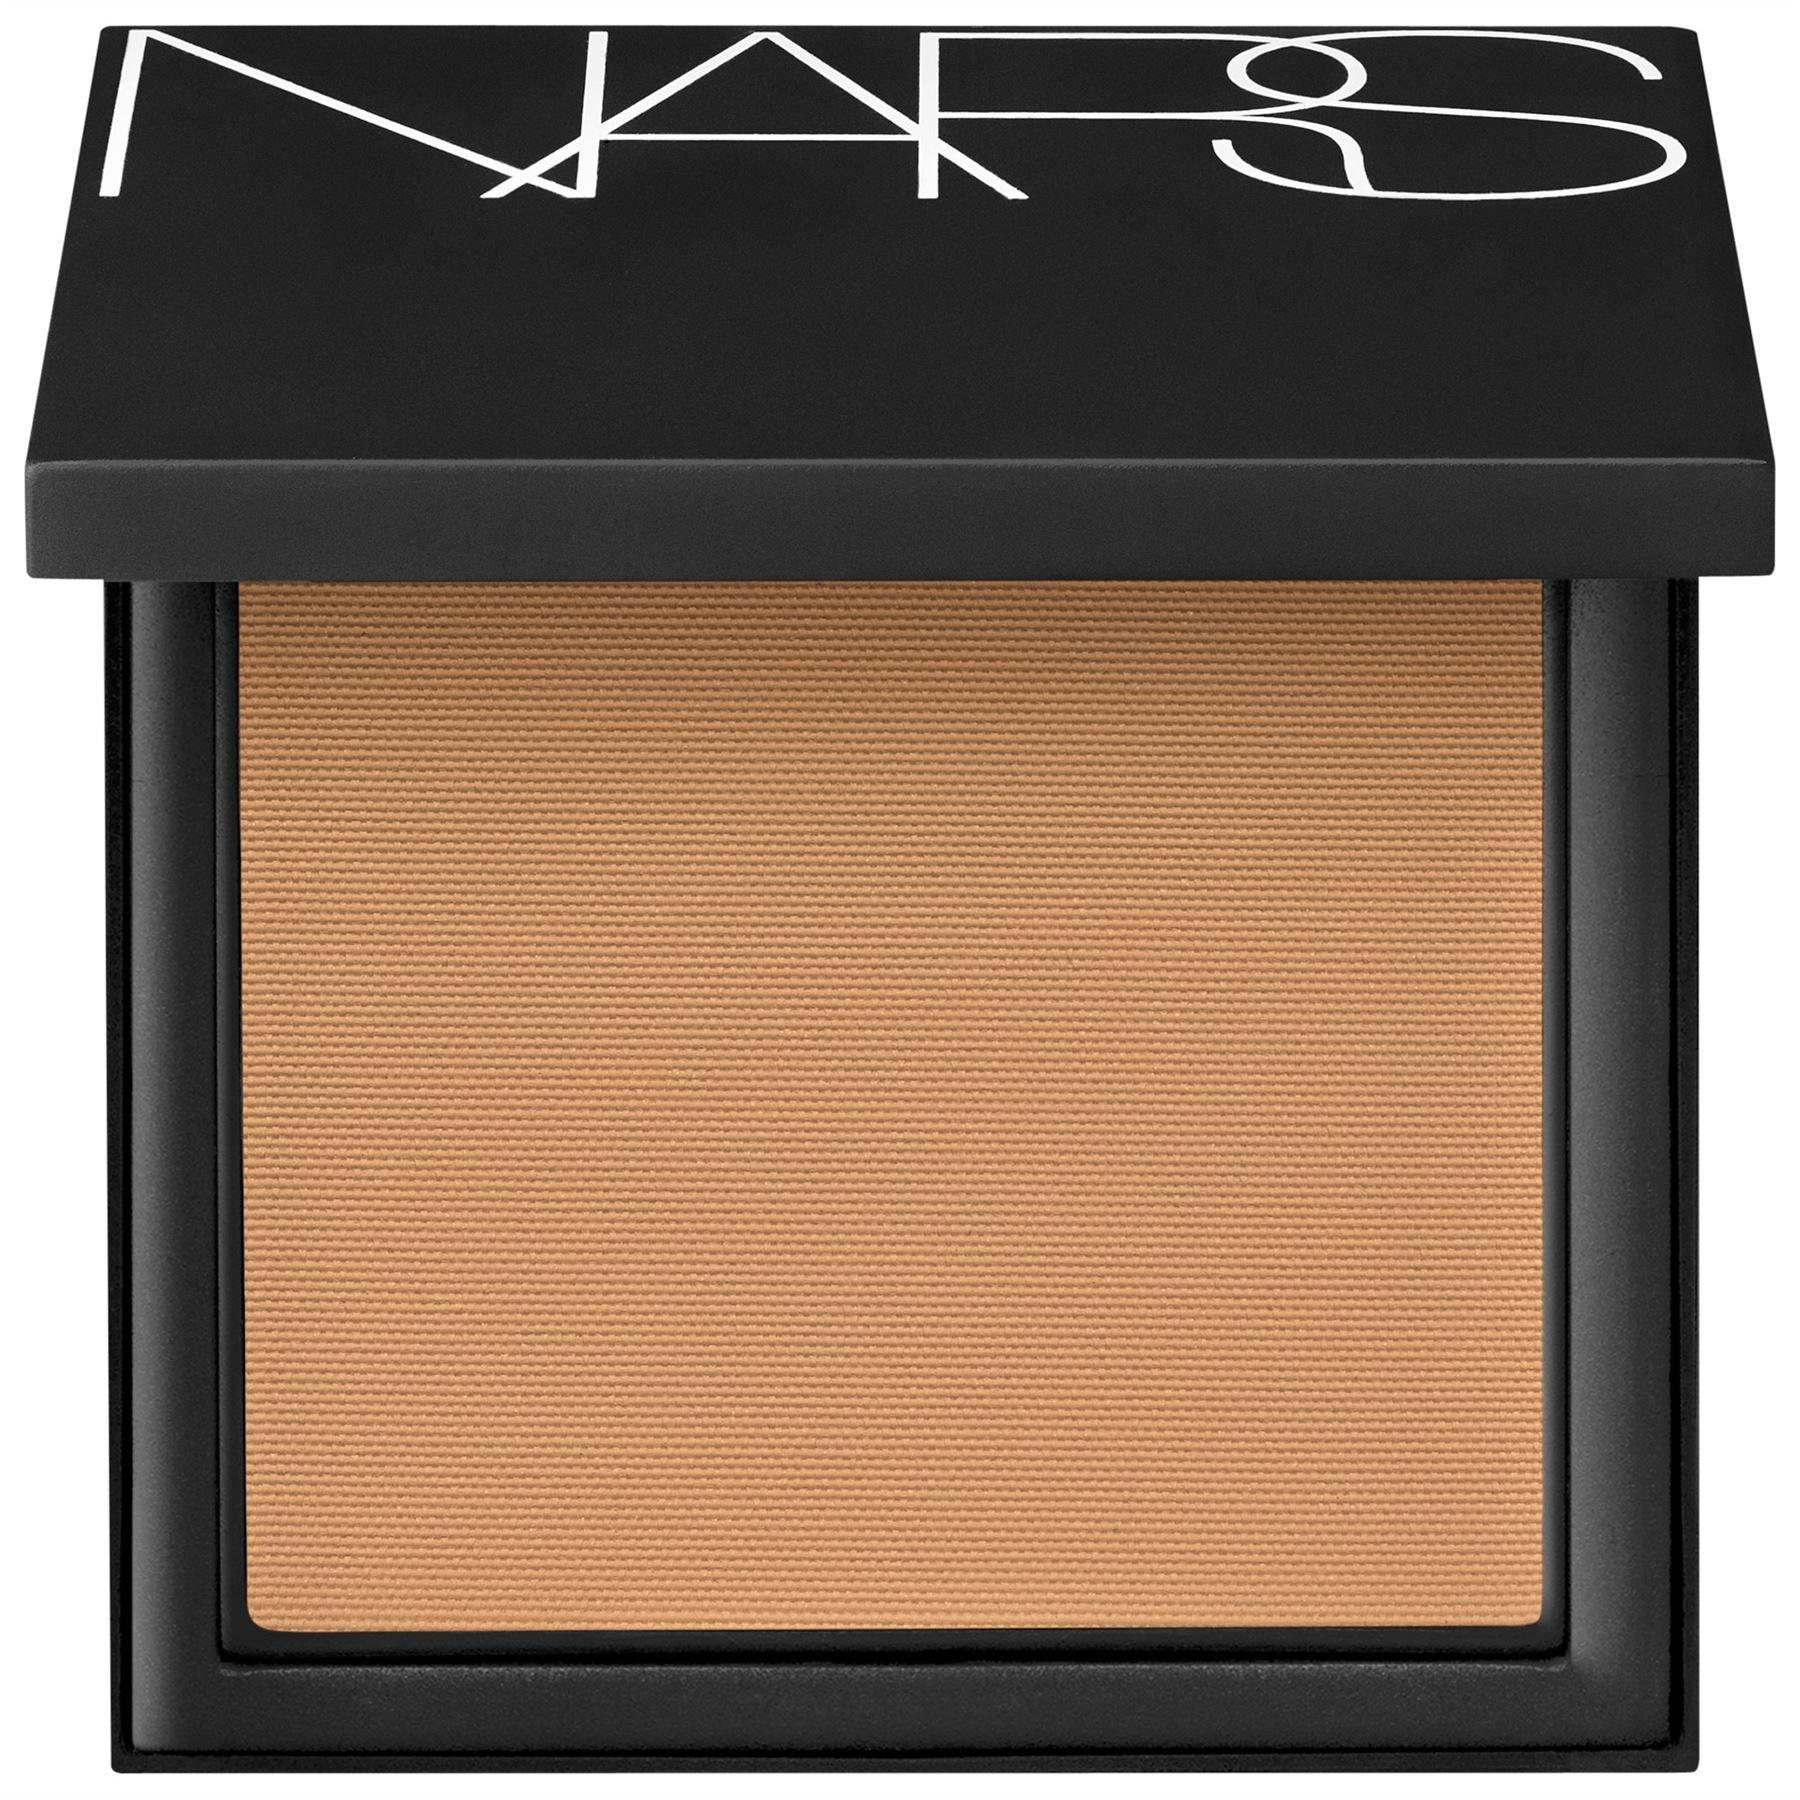 NARS Luminous Powder Foundation Tahoe - Pack of 6 by NARS (Image #1)